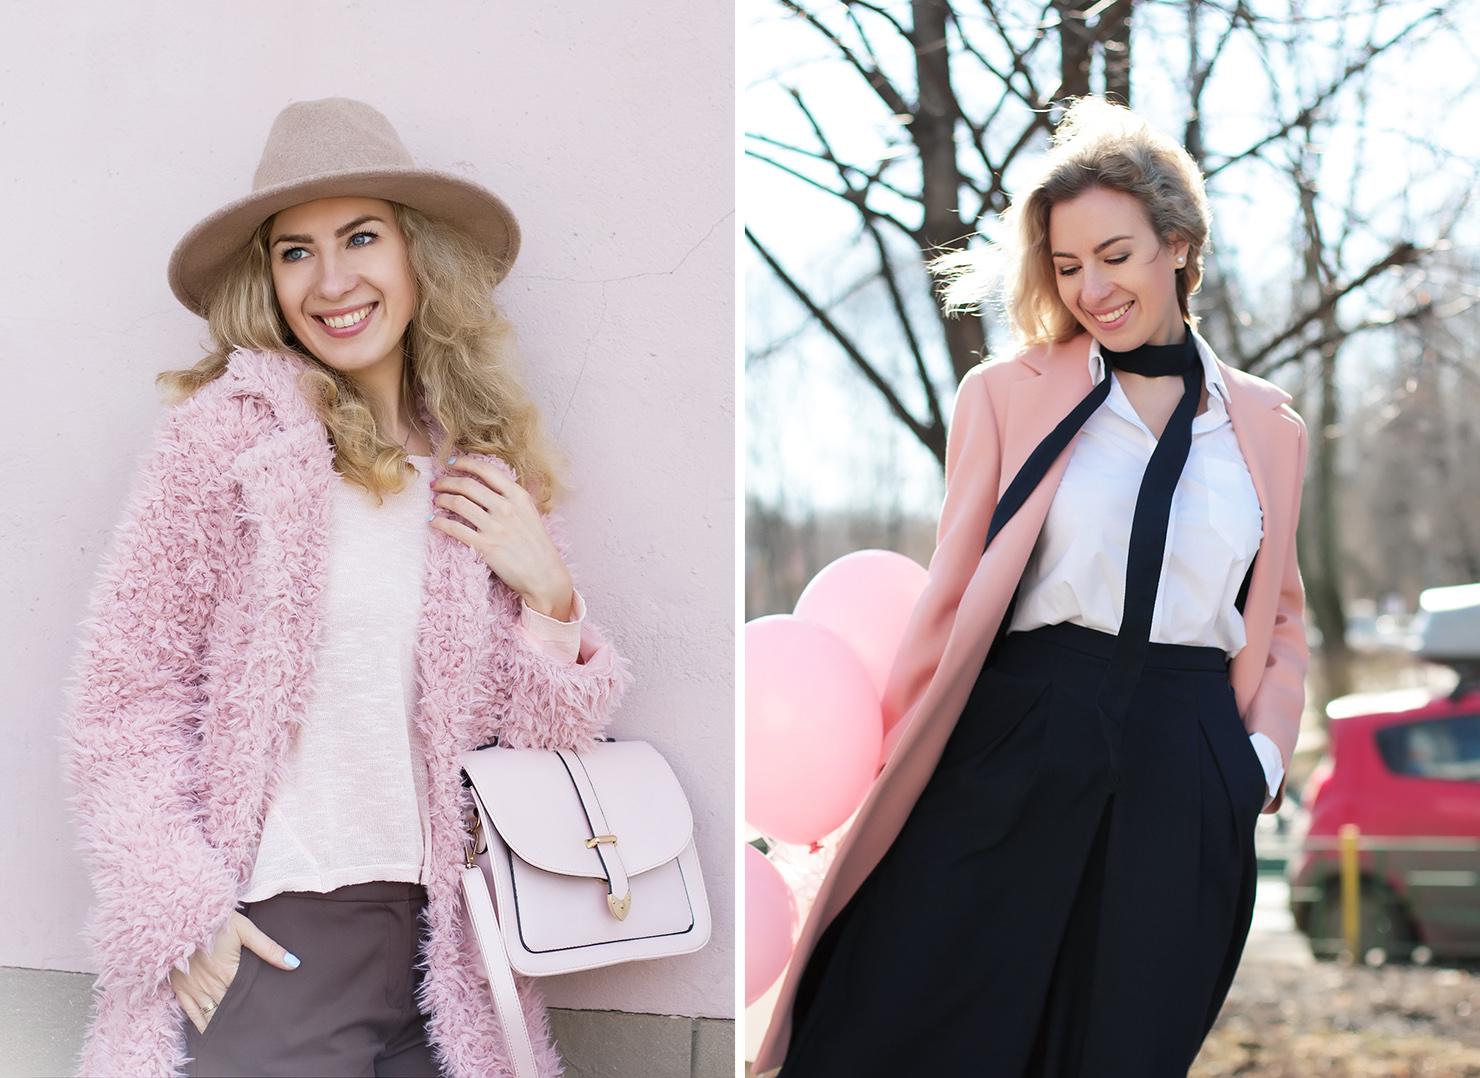 margarita_maslova_pink_fur_cardigan_hat2.jpg